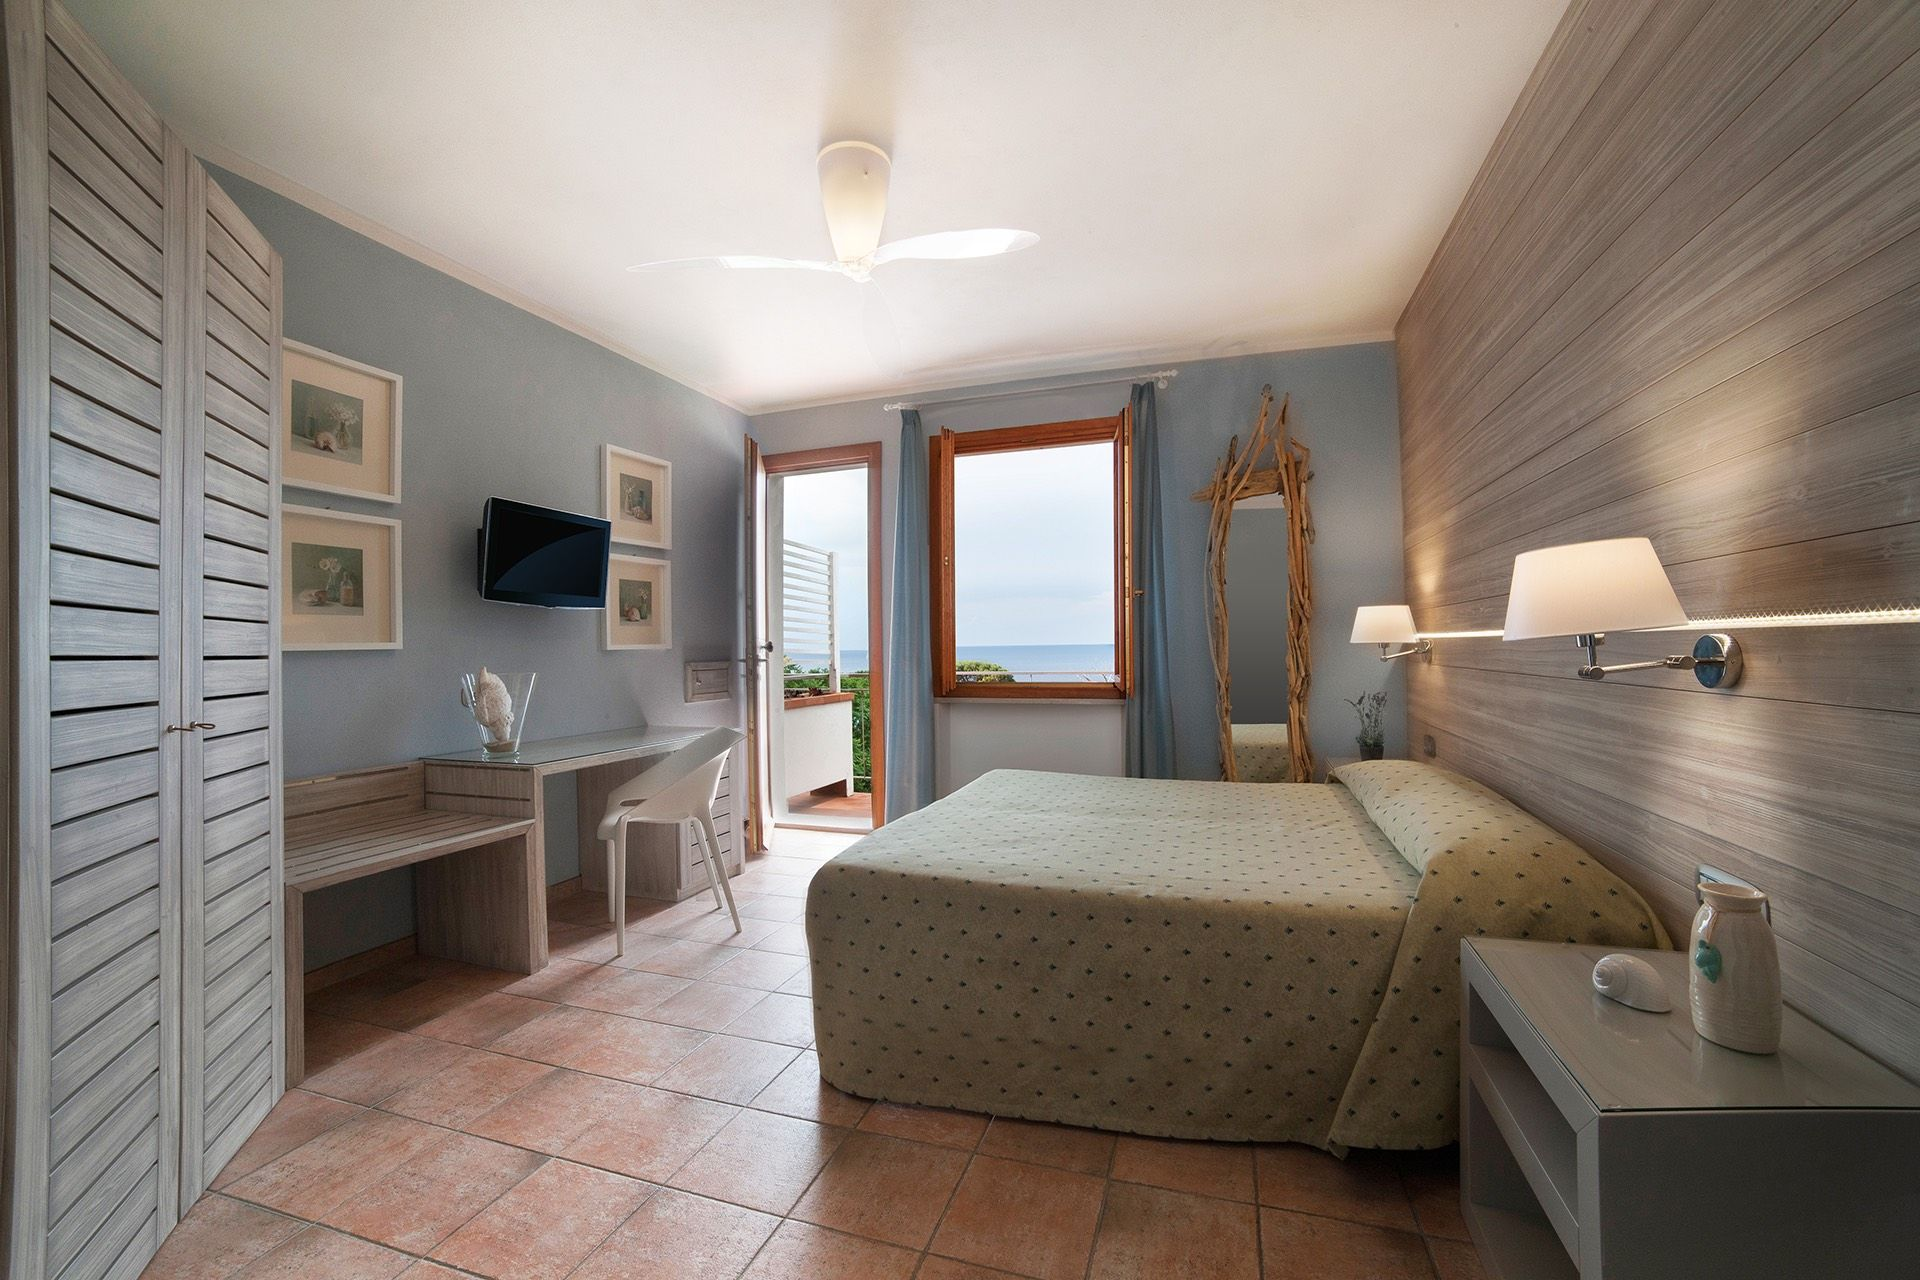 Enjoy a stay on Elba in a brand new hotel! Regalatevi un